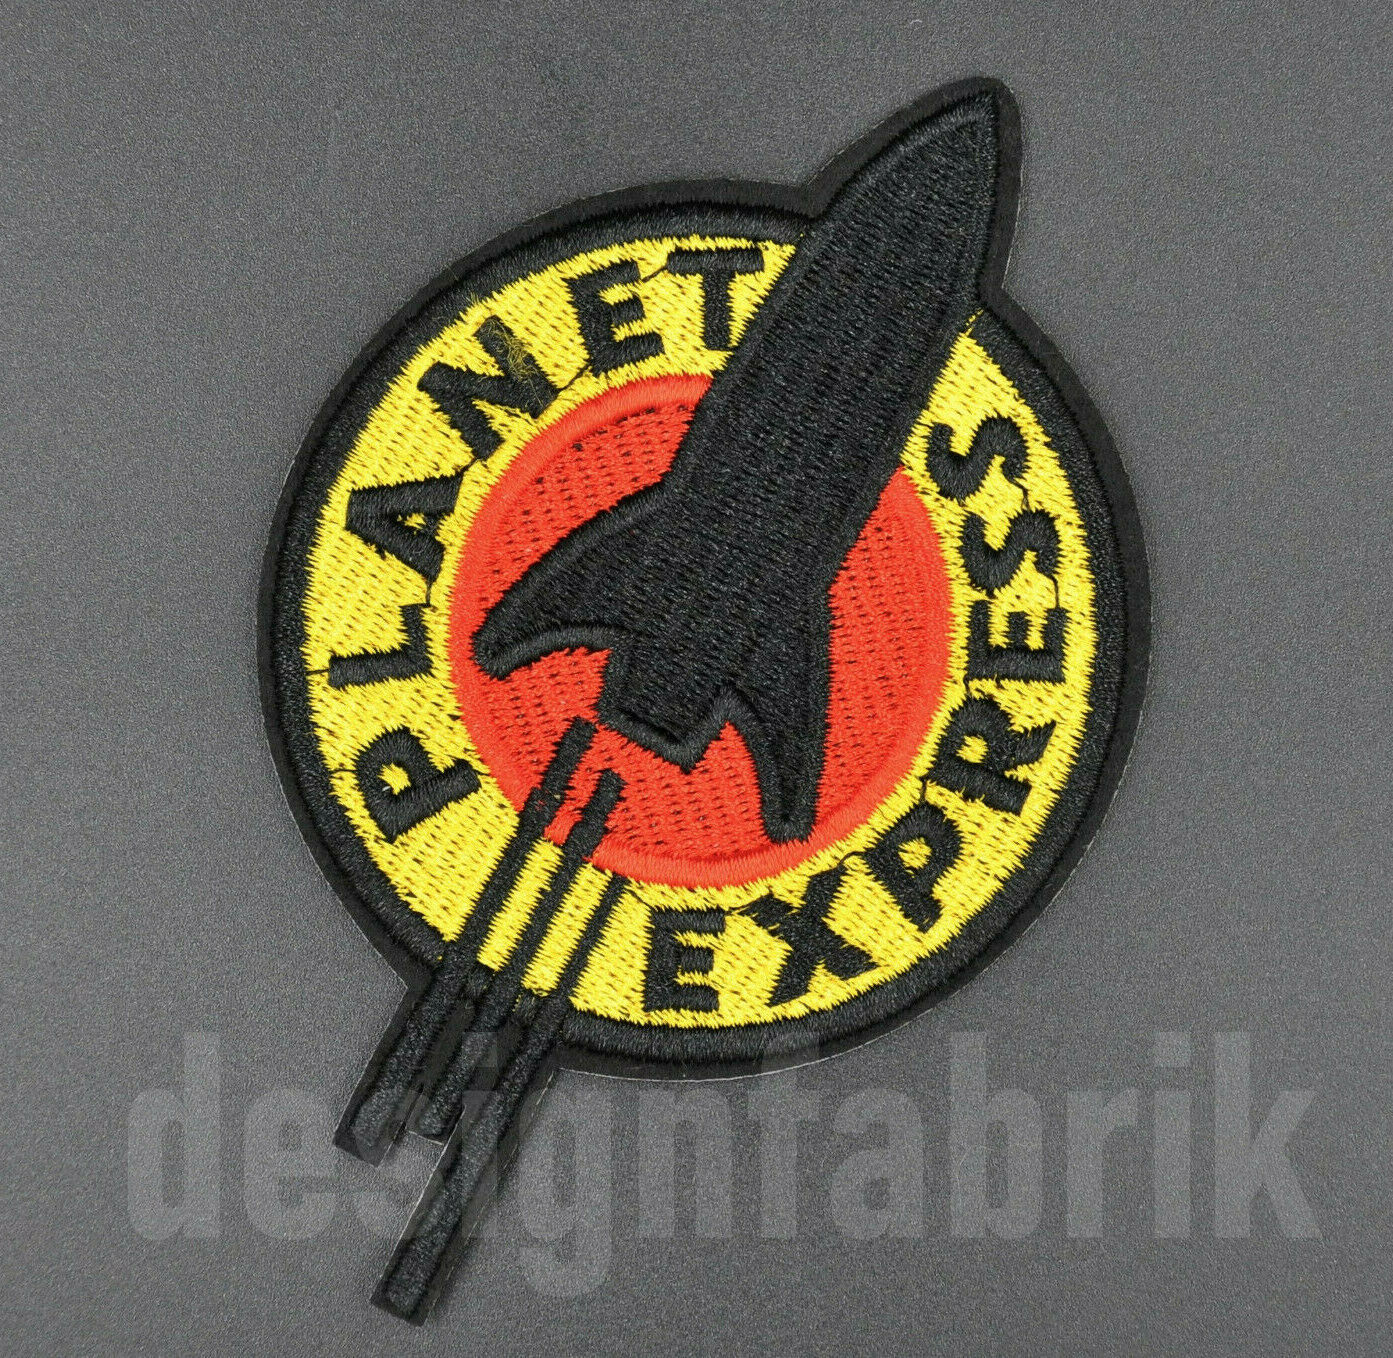 PATCH Planet Express RAKETE Astronaut AUFBÜGELN Bügel Bild Aufnäher Applikation